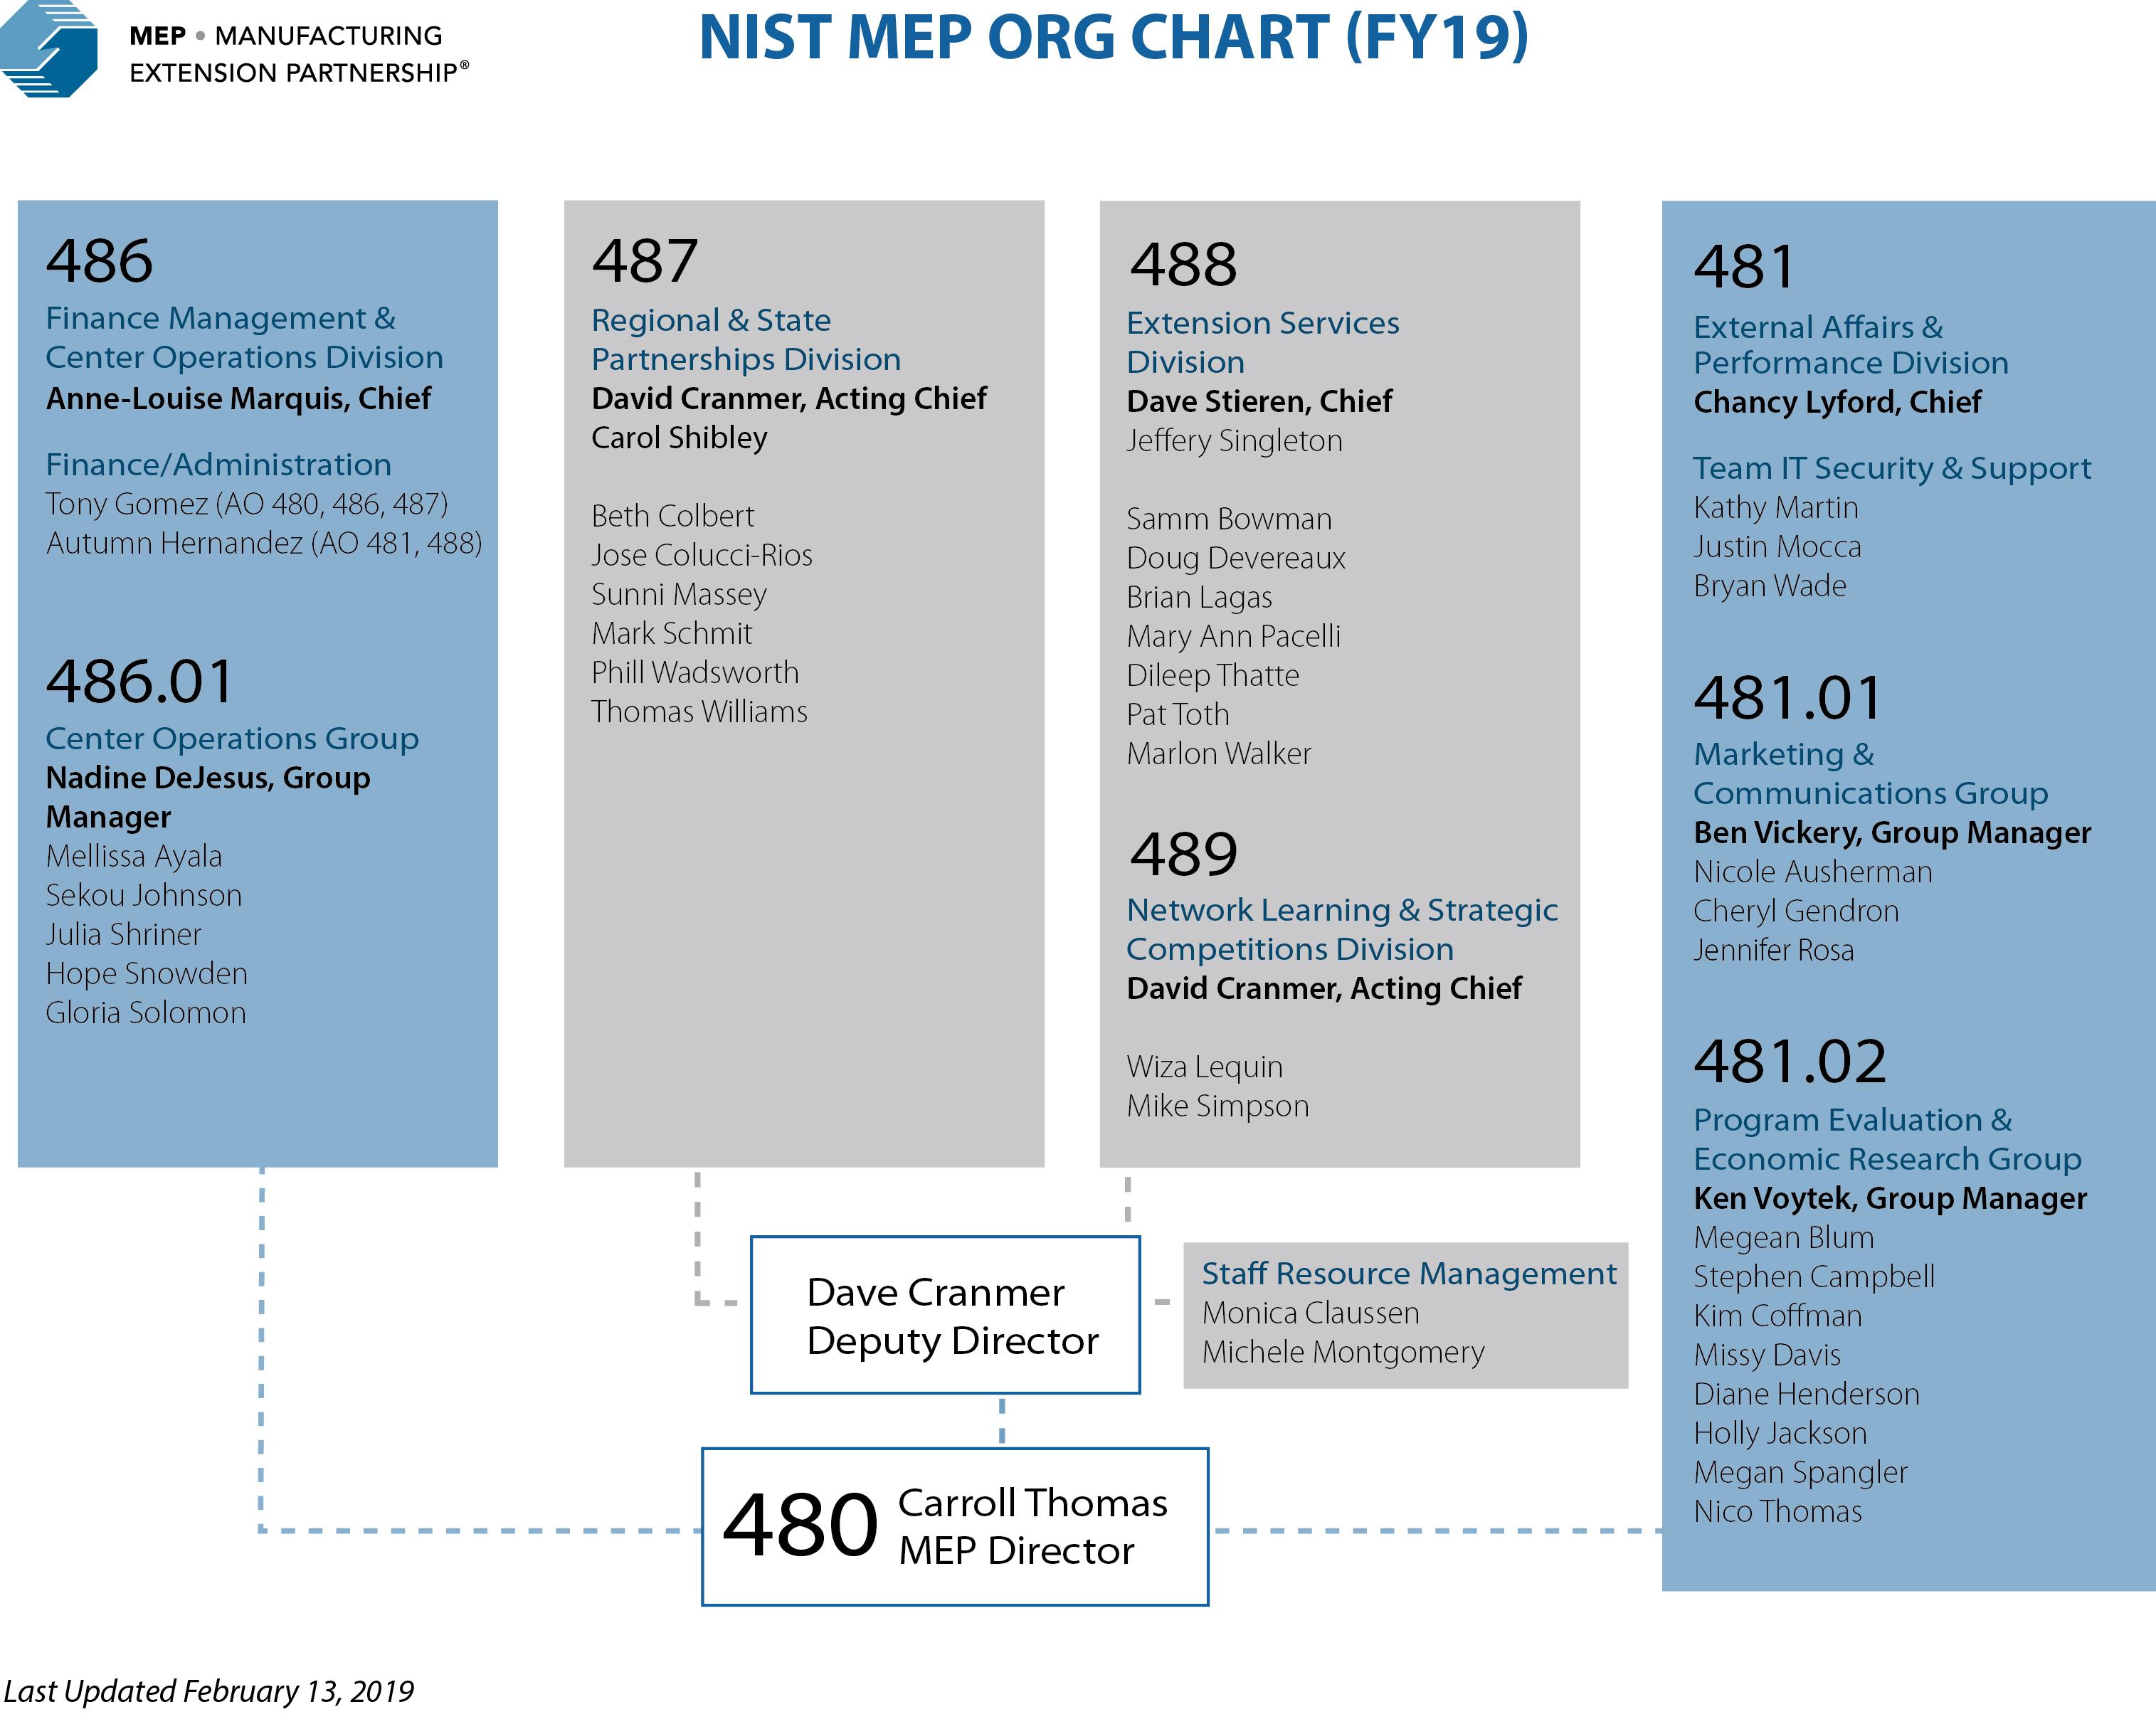 NIST MEP organizational chart showing all staff